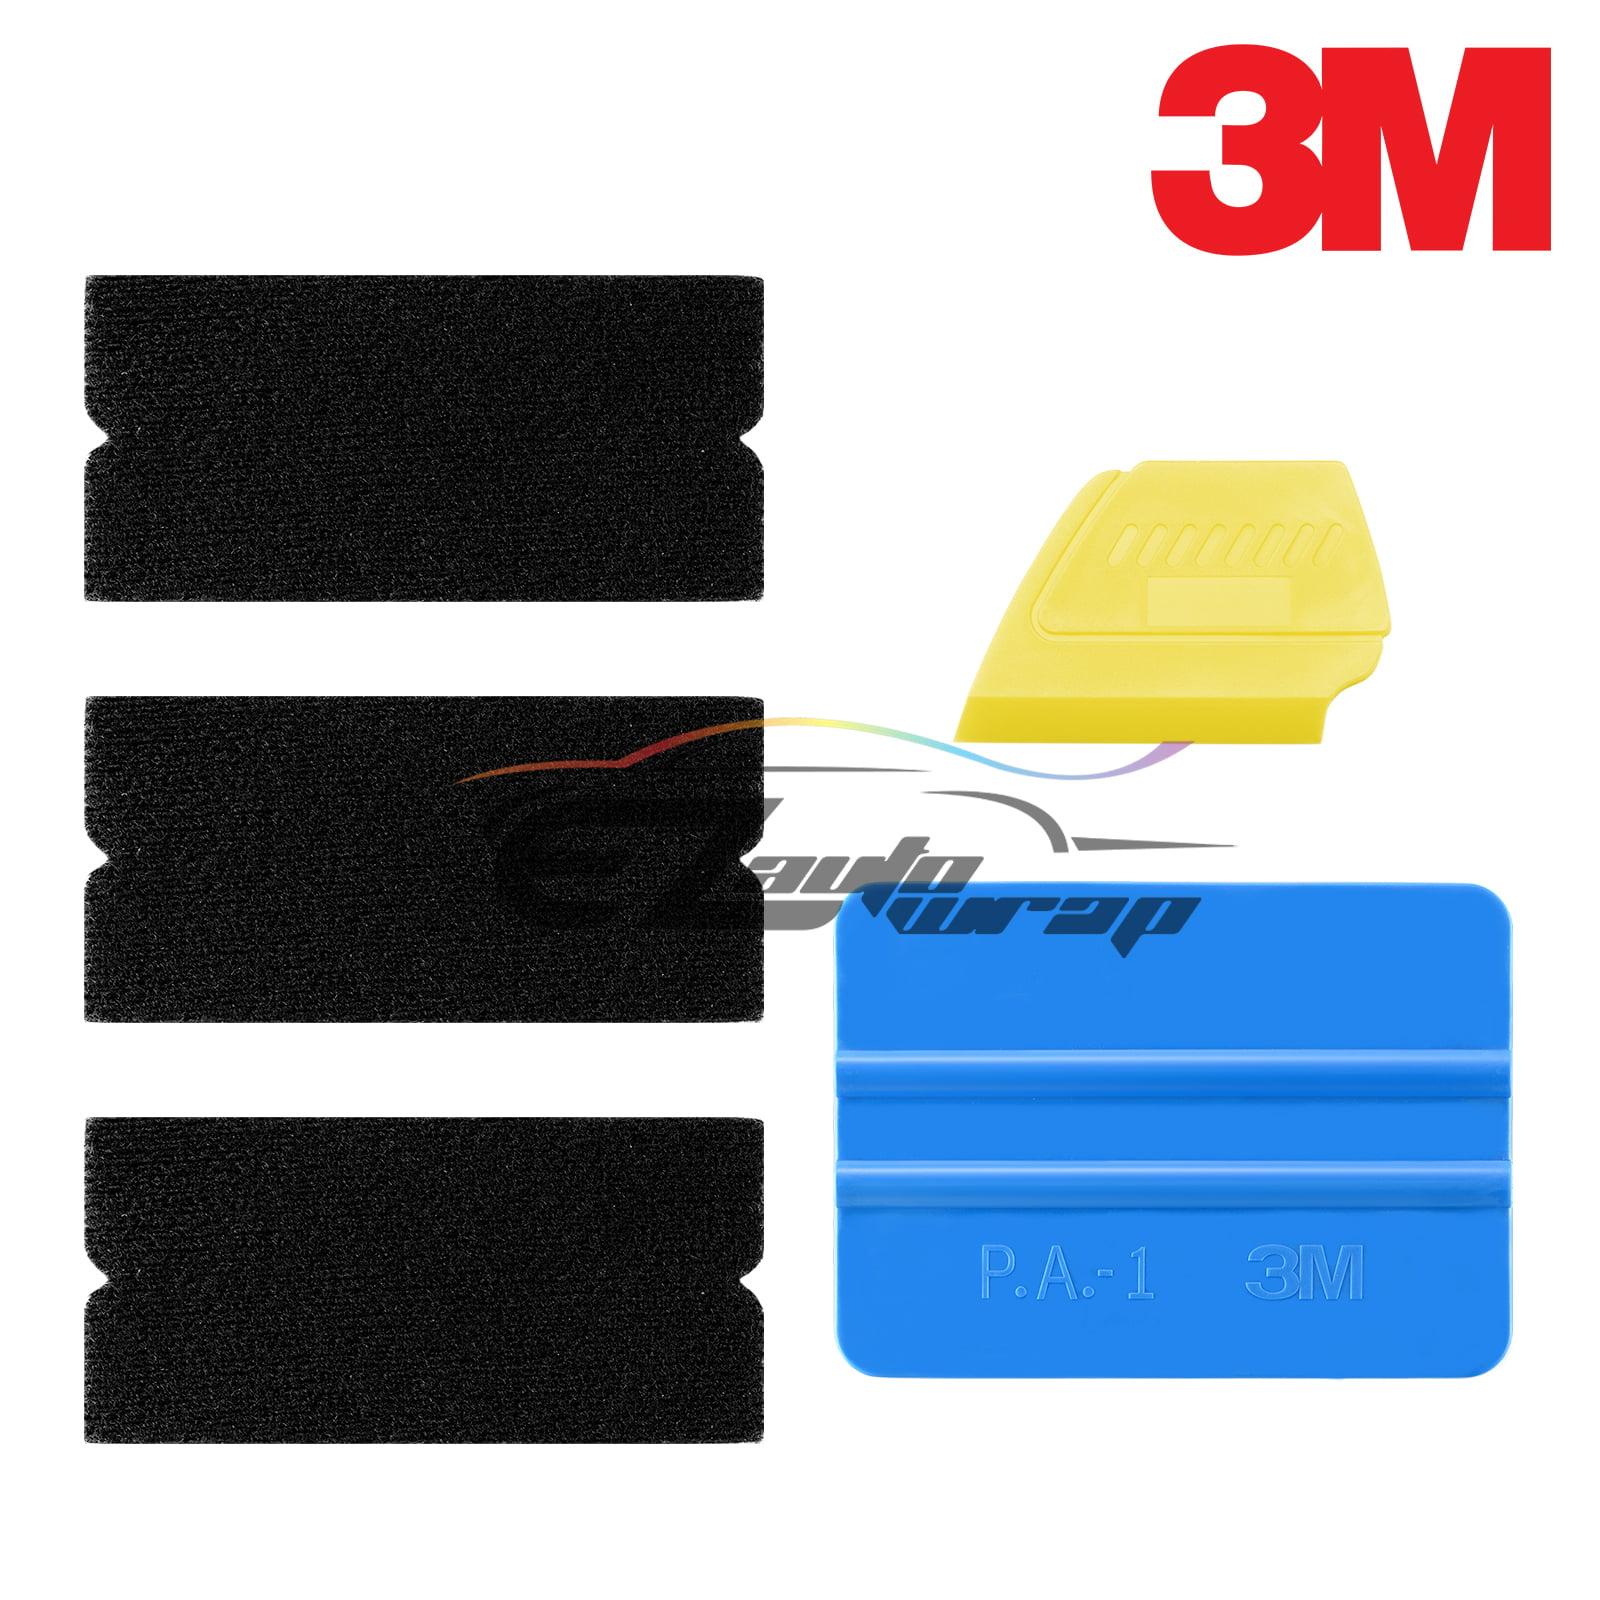 WINJUN 6 in 1 Auto Window Tinting Kits Vinyl Wraps Tool with Felt Edge Squeegee Water Blade Windshield Wiper Plastic Glass Scraper